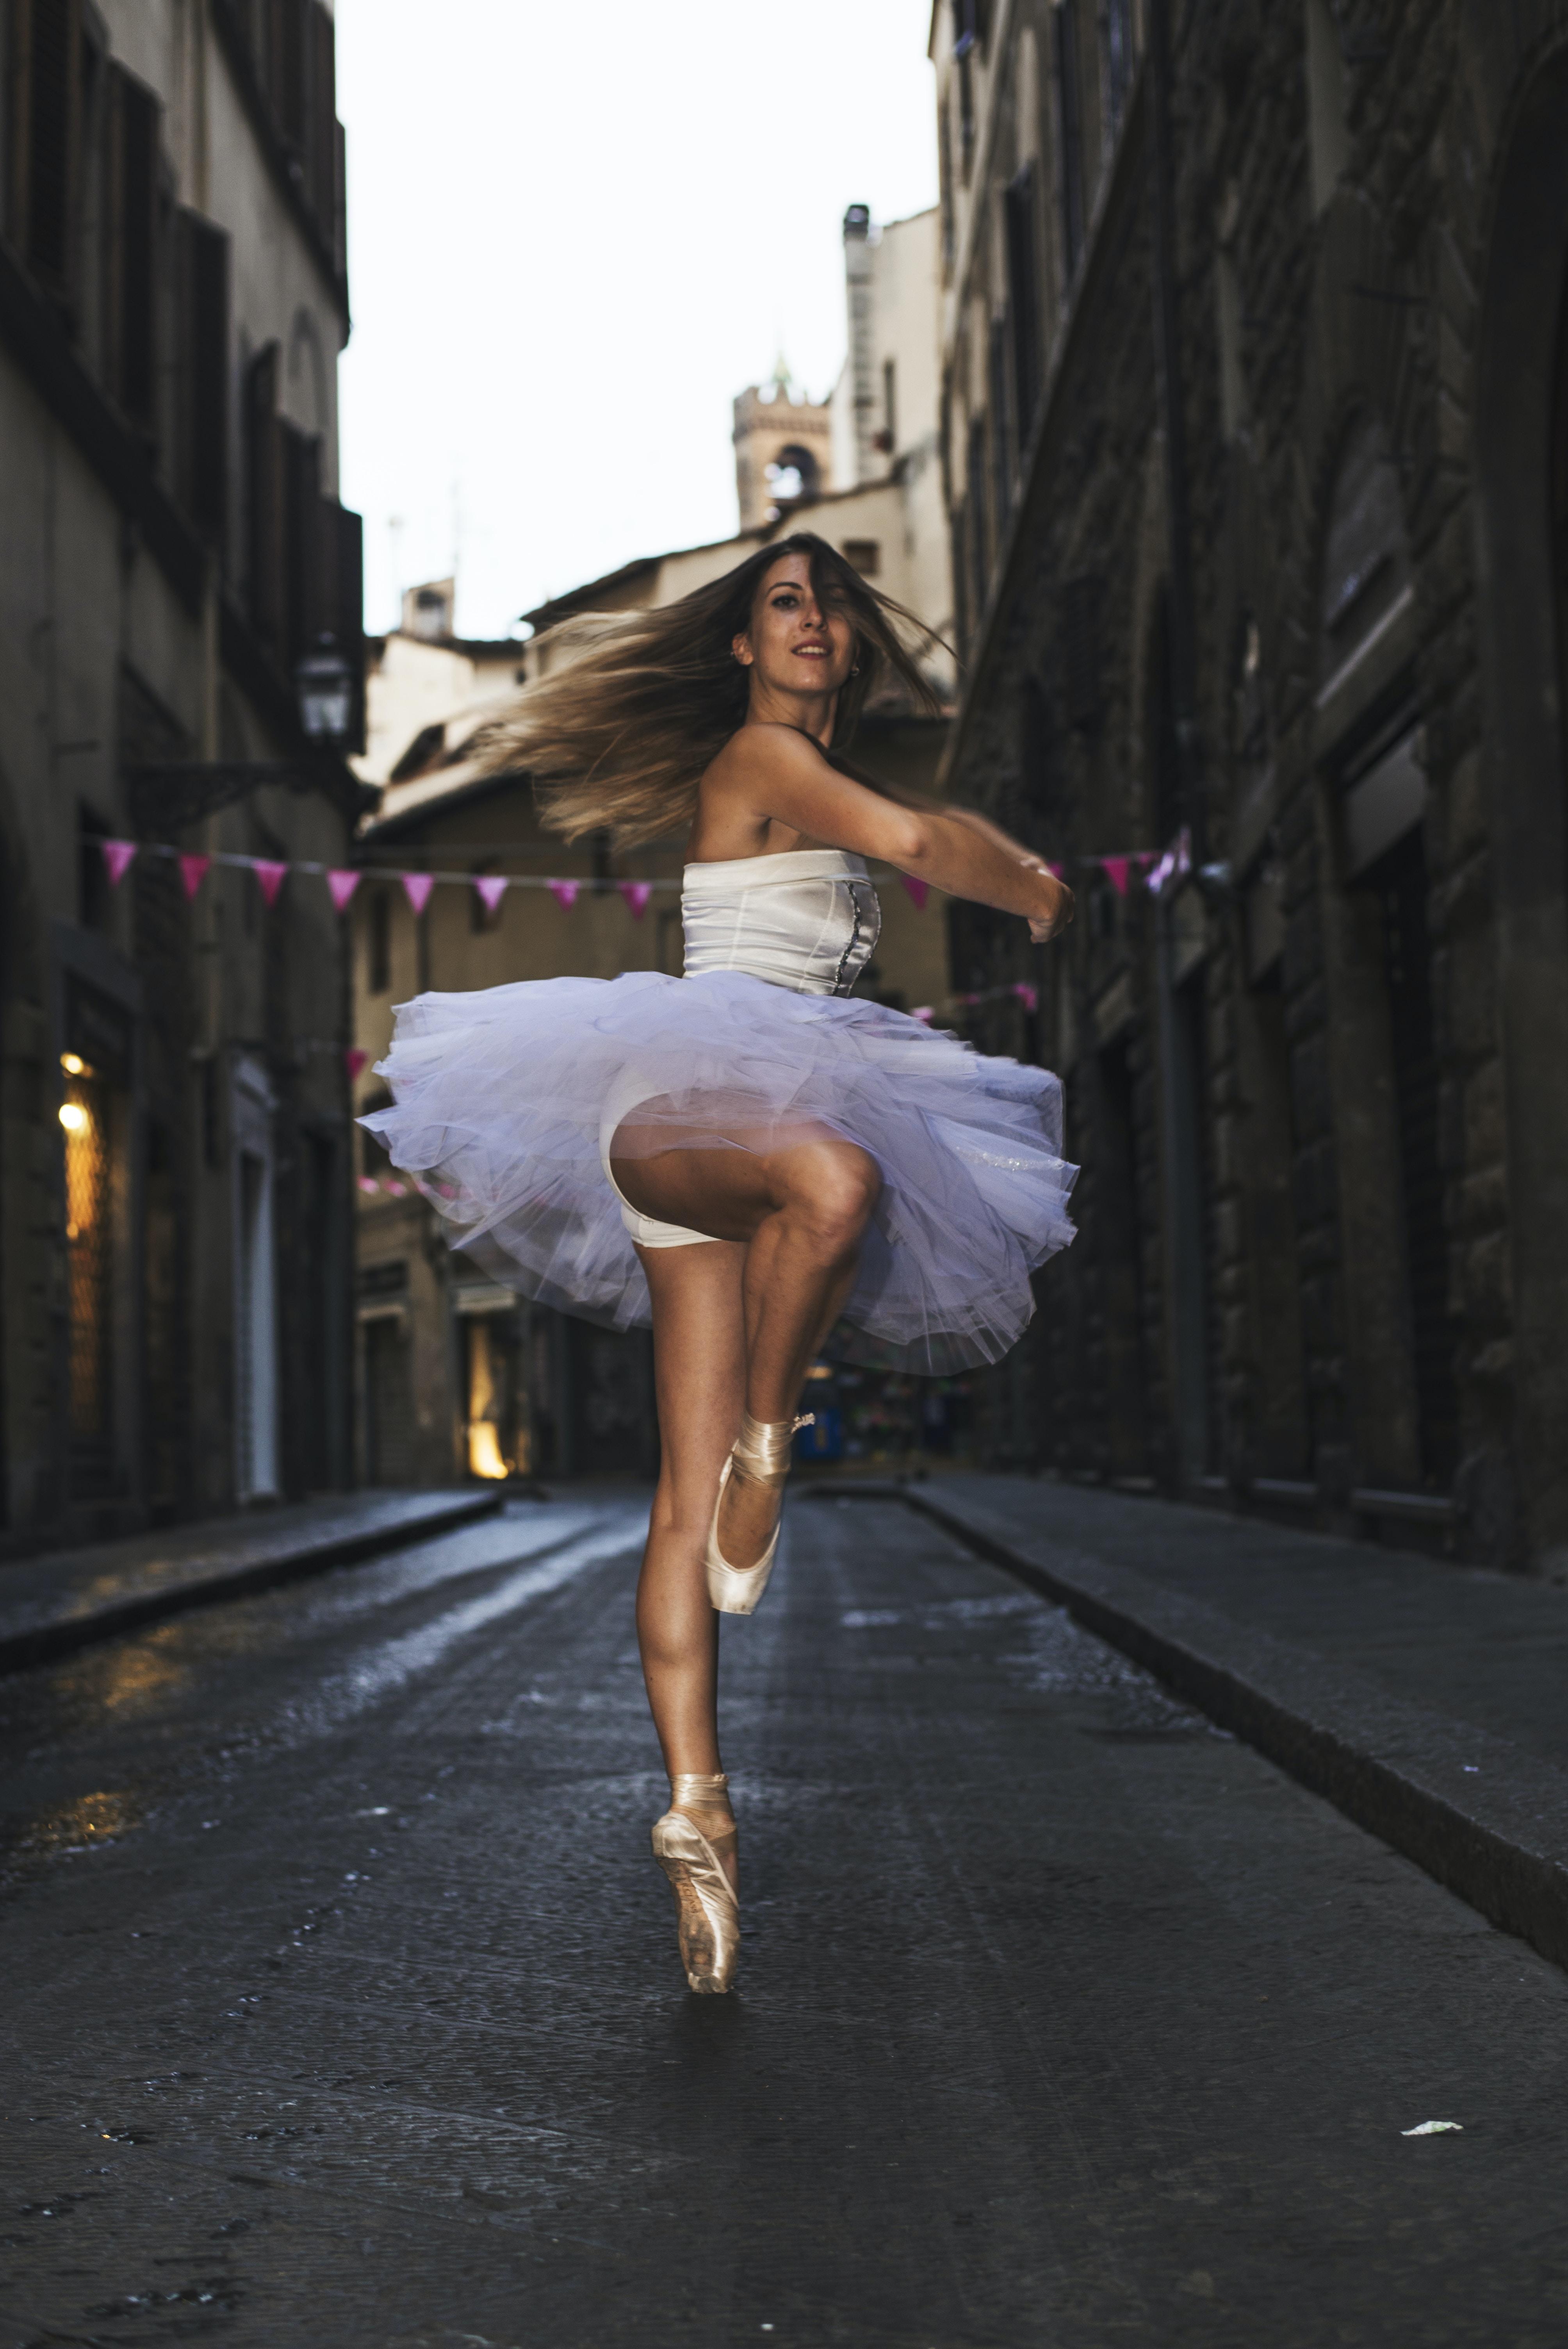 ballerina woman dancing outdoors